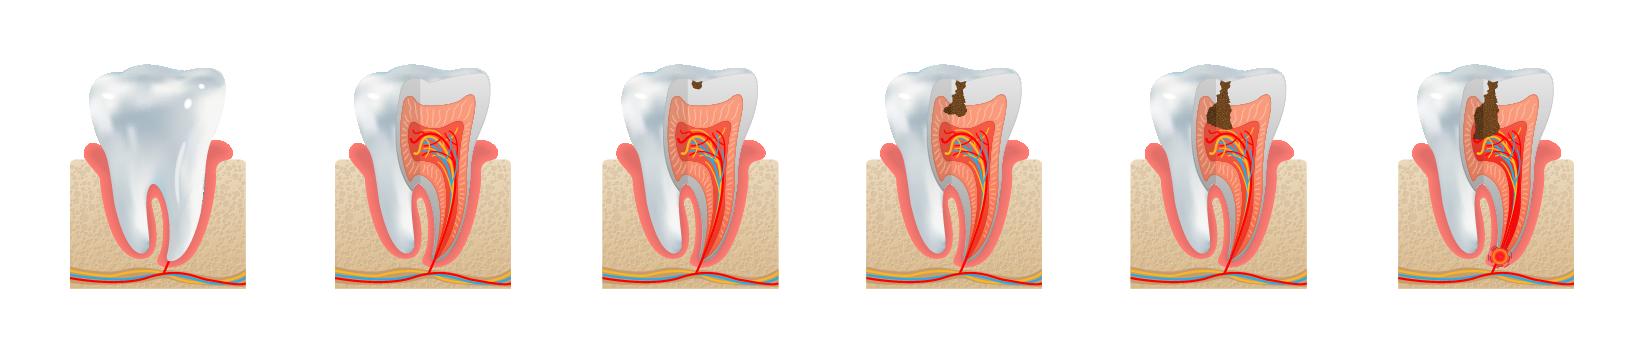 Cavity Formation